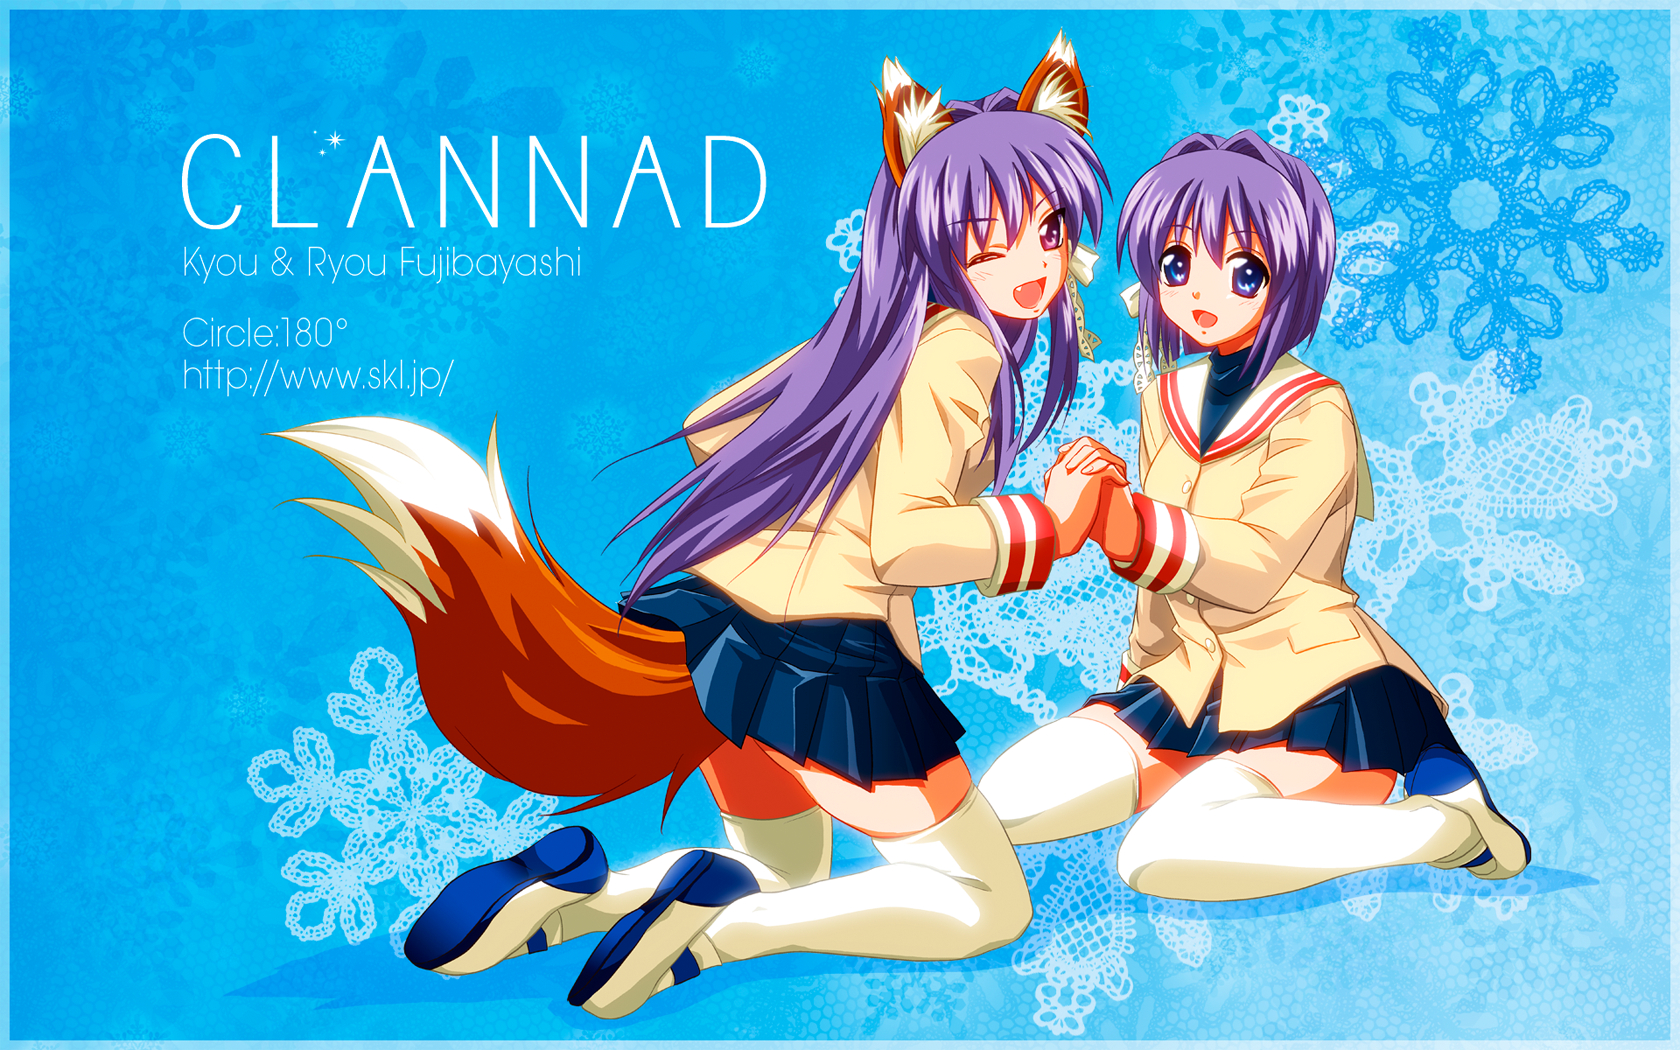 2girls animal_ears blue clannad fujibayashi_kyou fujibayashi_ryou naka_noboru purple_hair school_uniform tail twins wink